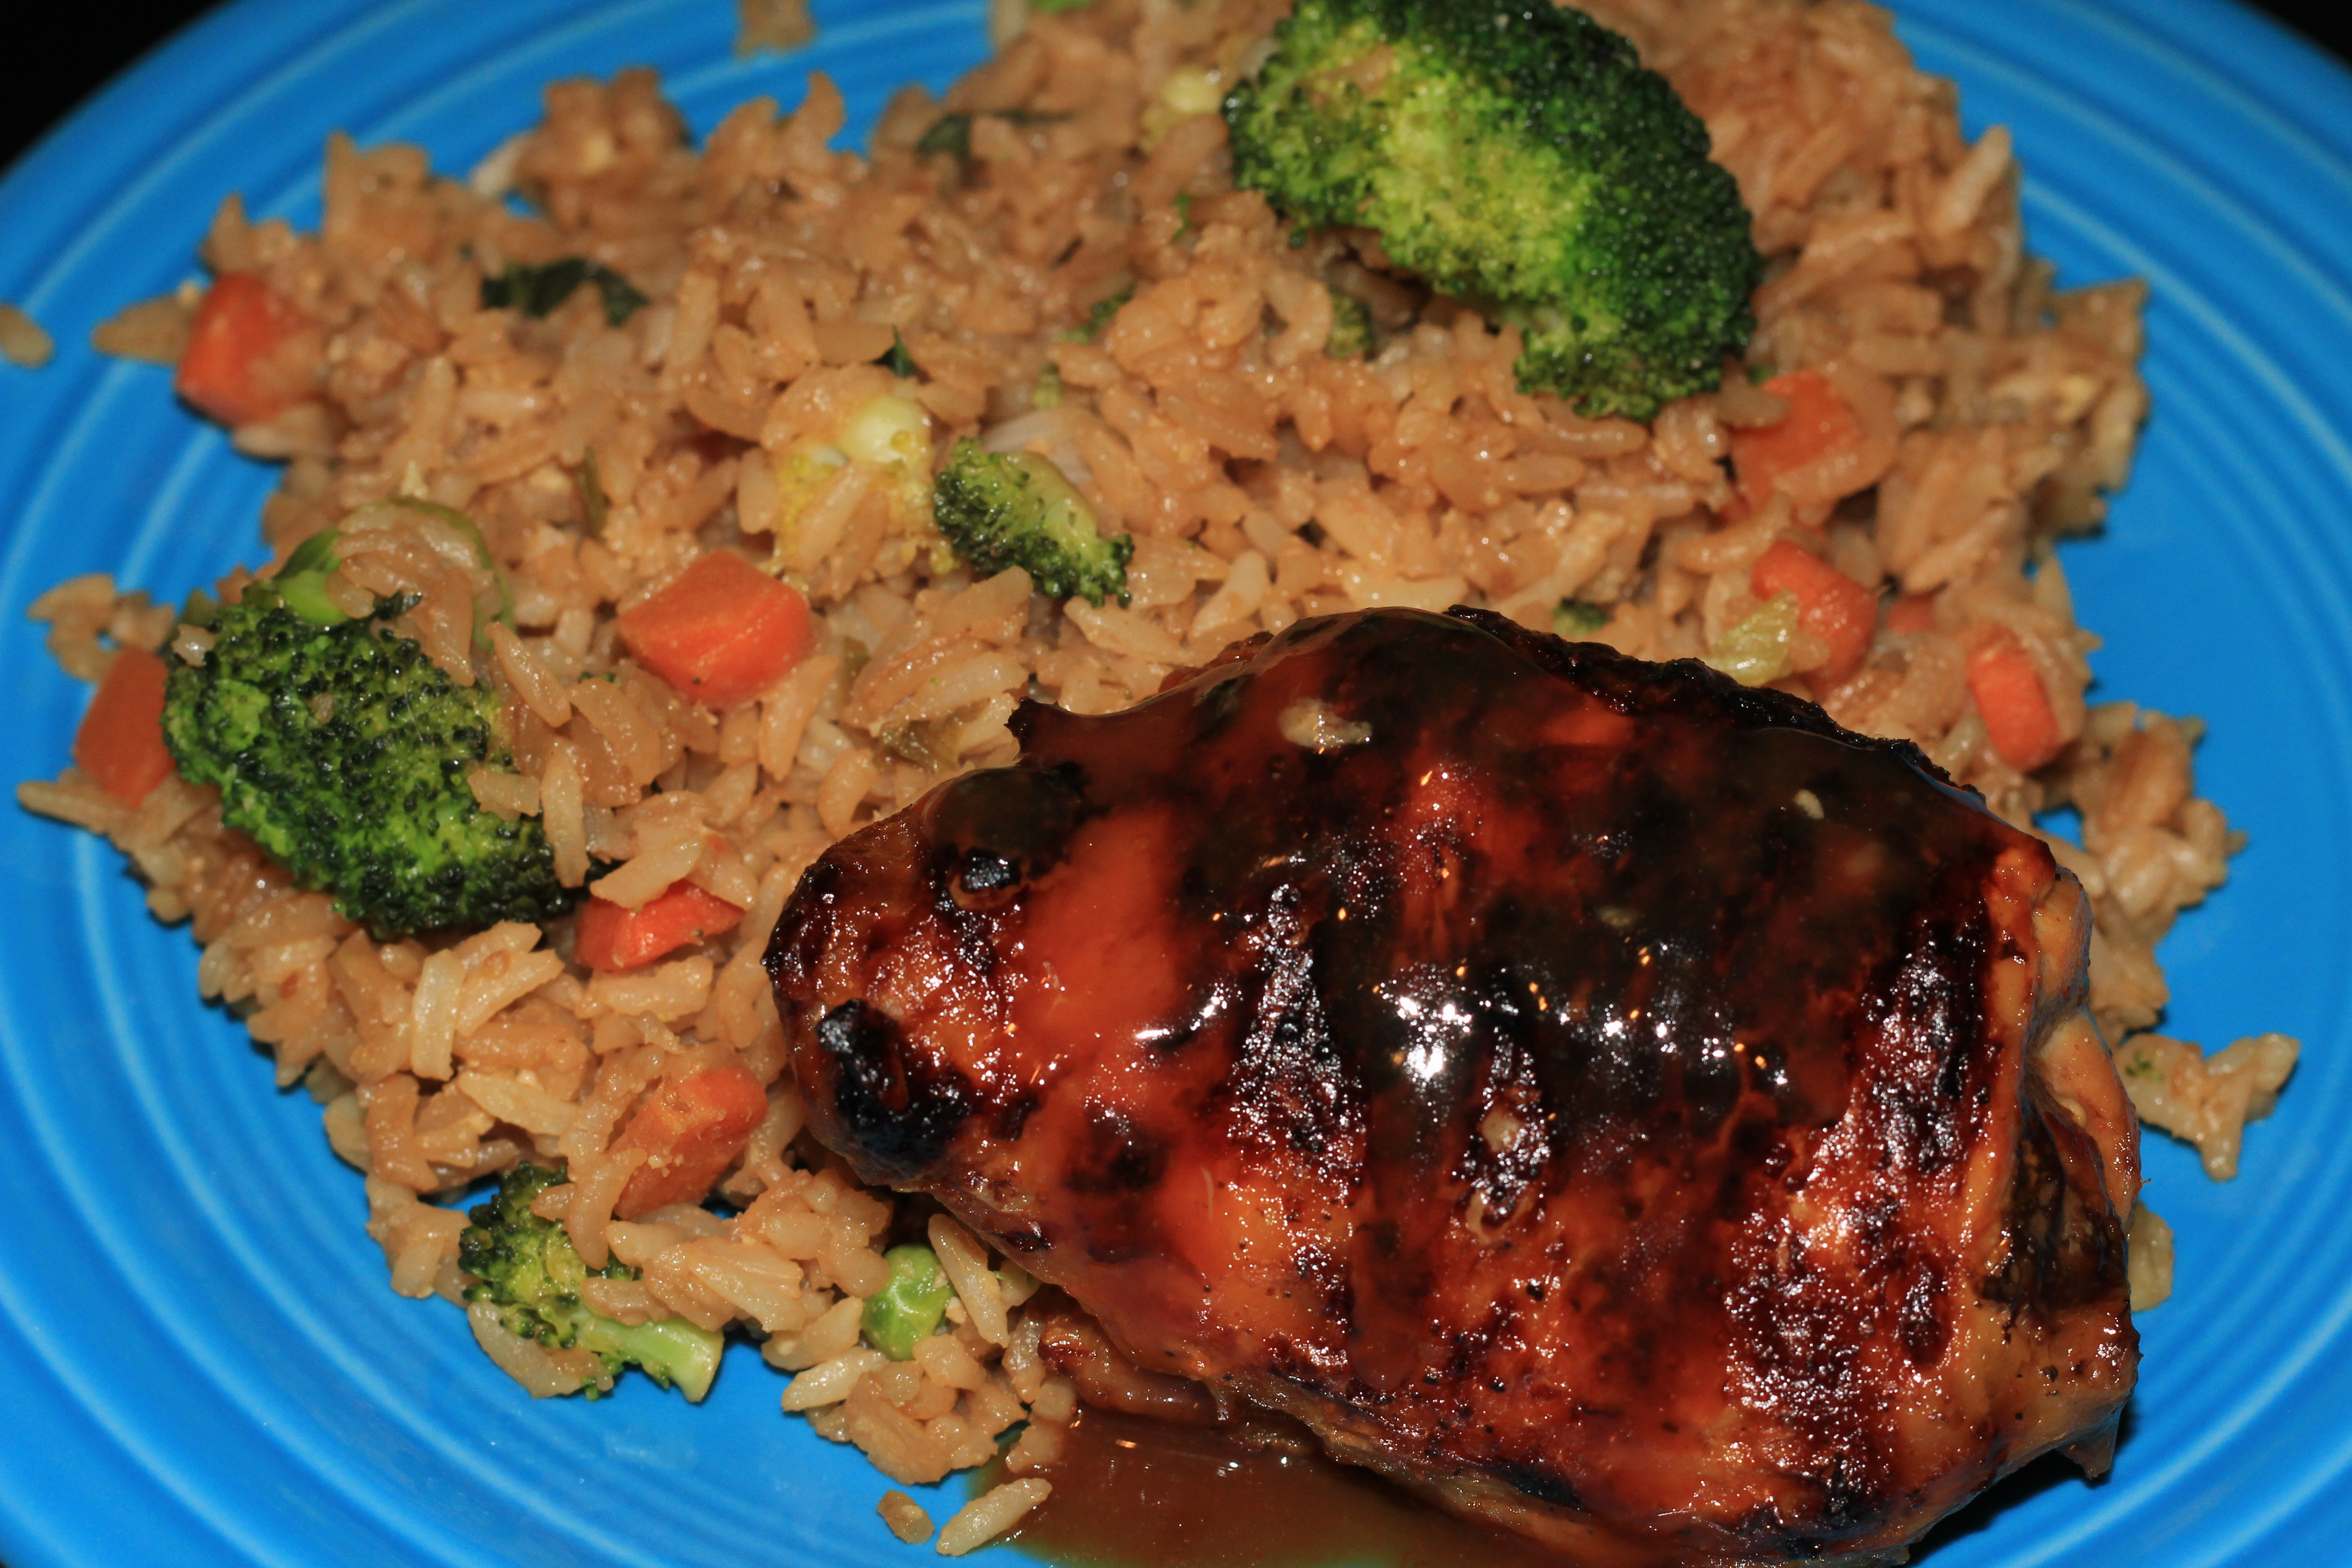 Orange Glazed Chicken and Vegetable Fried Rice